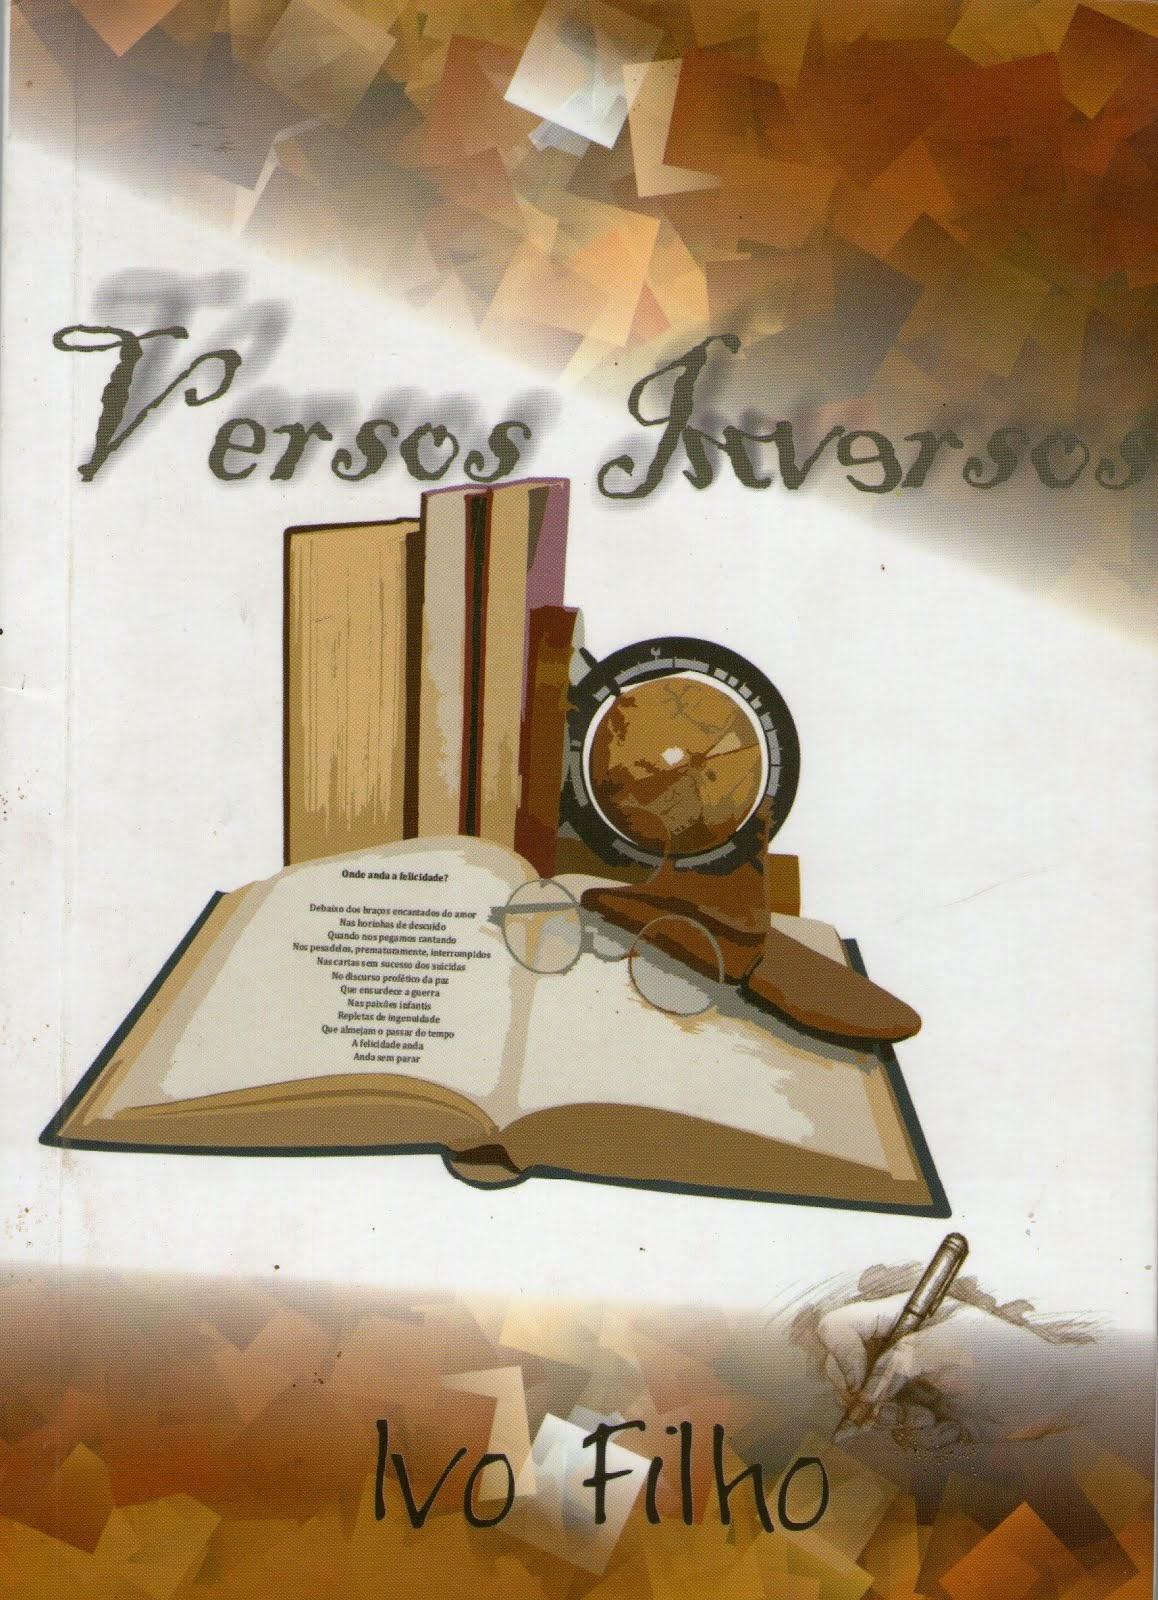 Versos Inversos